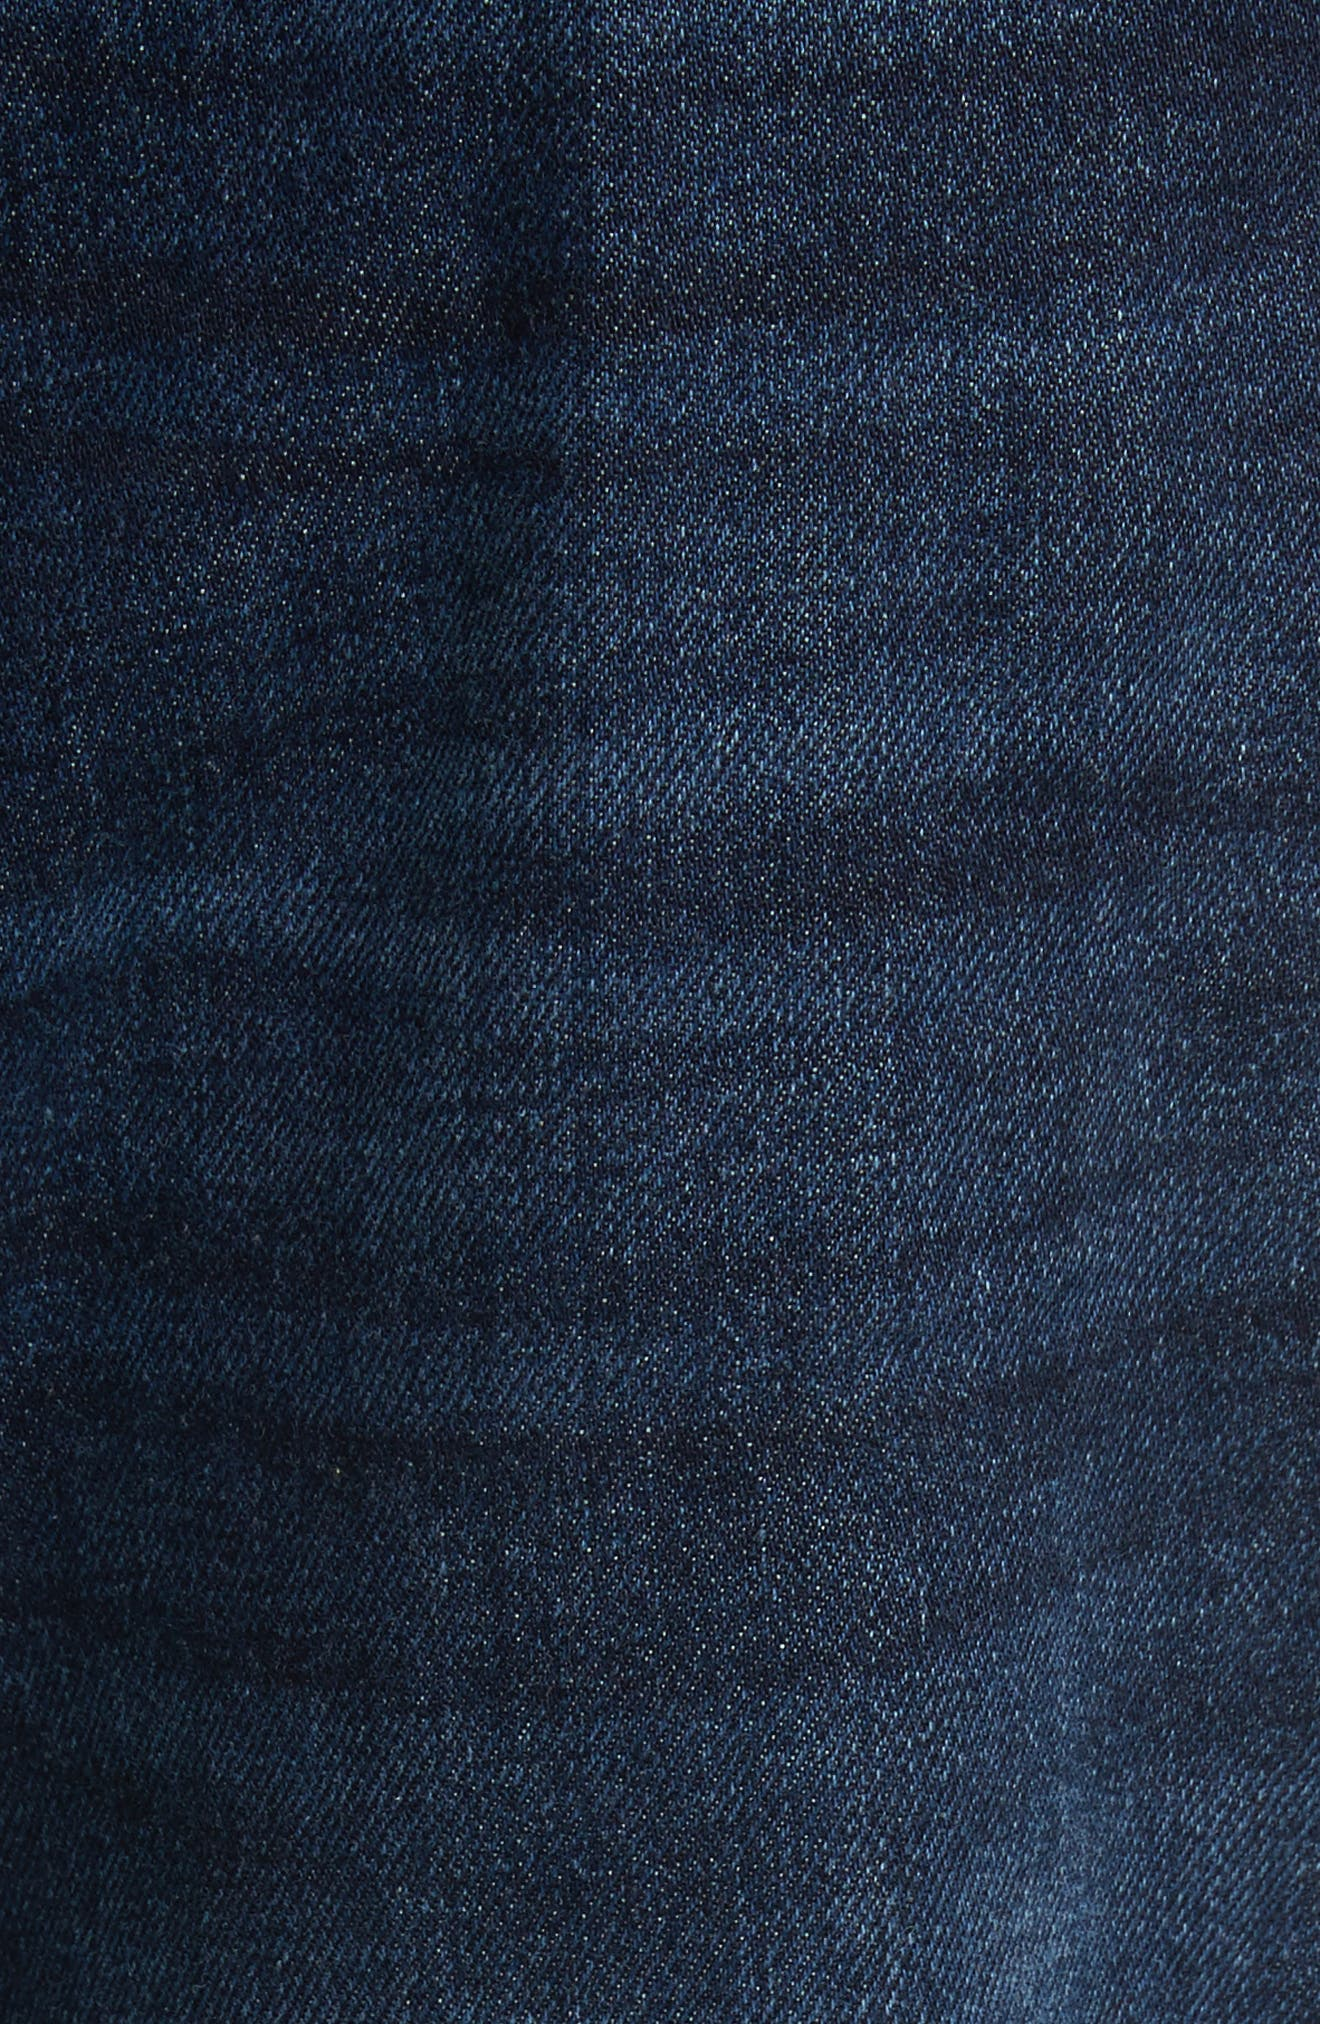 Land Classic Straight Leg Jeans,                             Alternate thumbnail 5, color,                             123 Dk Blue